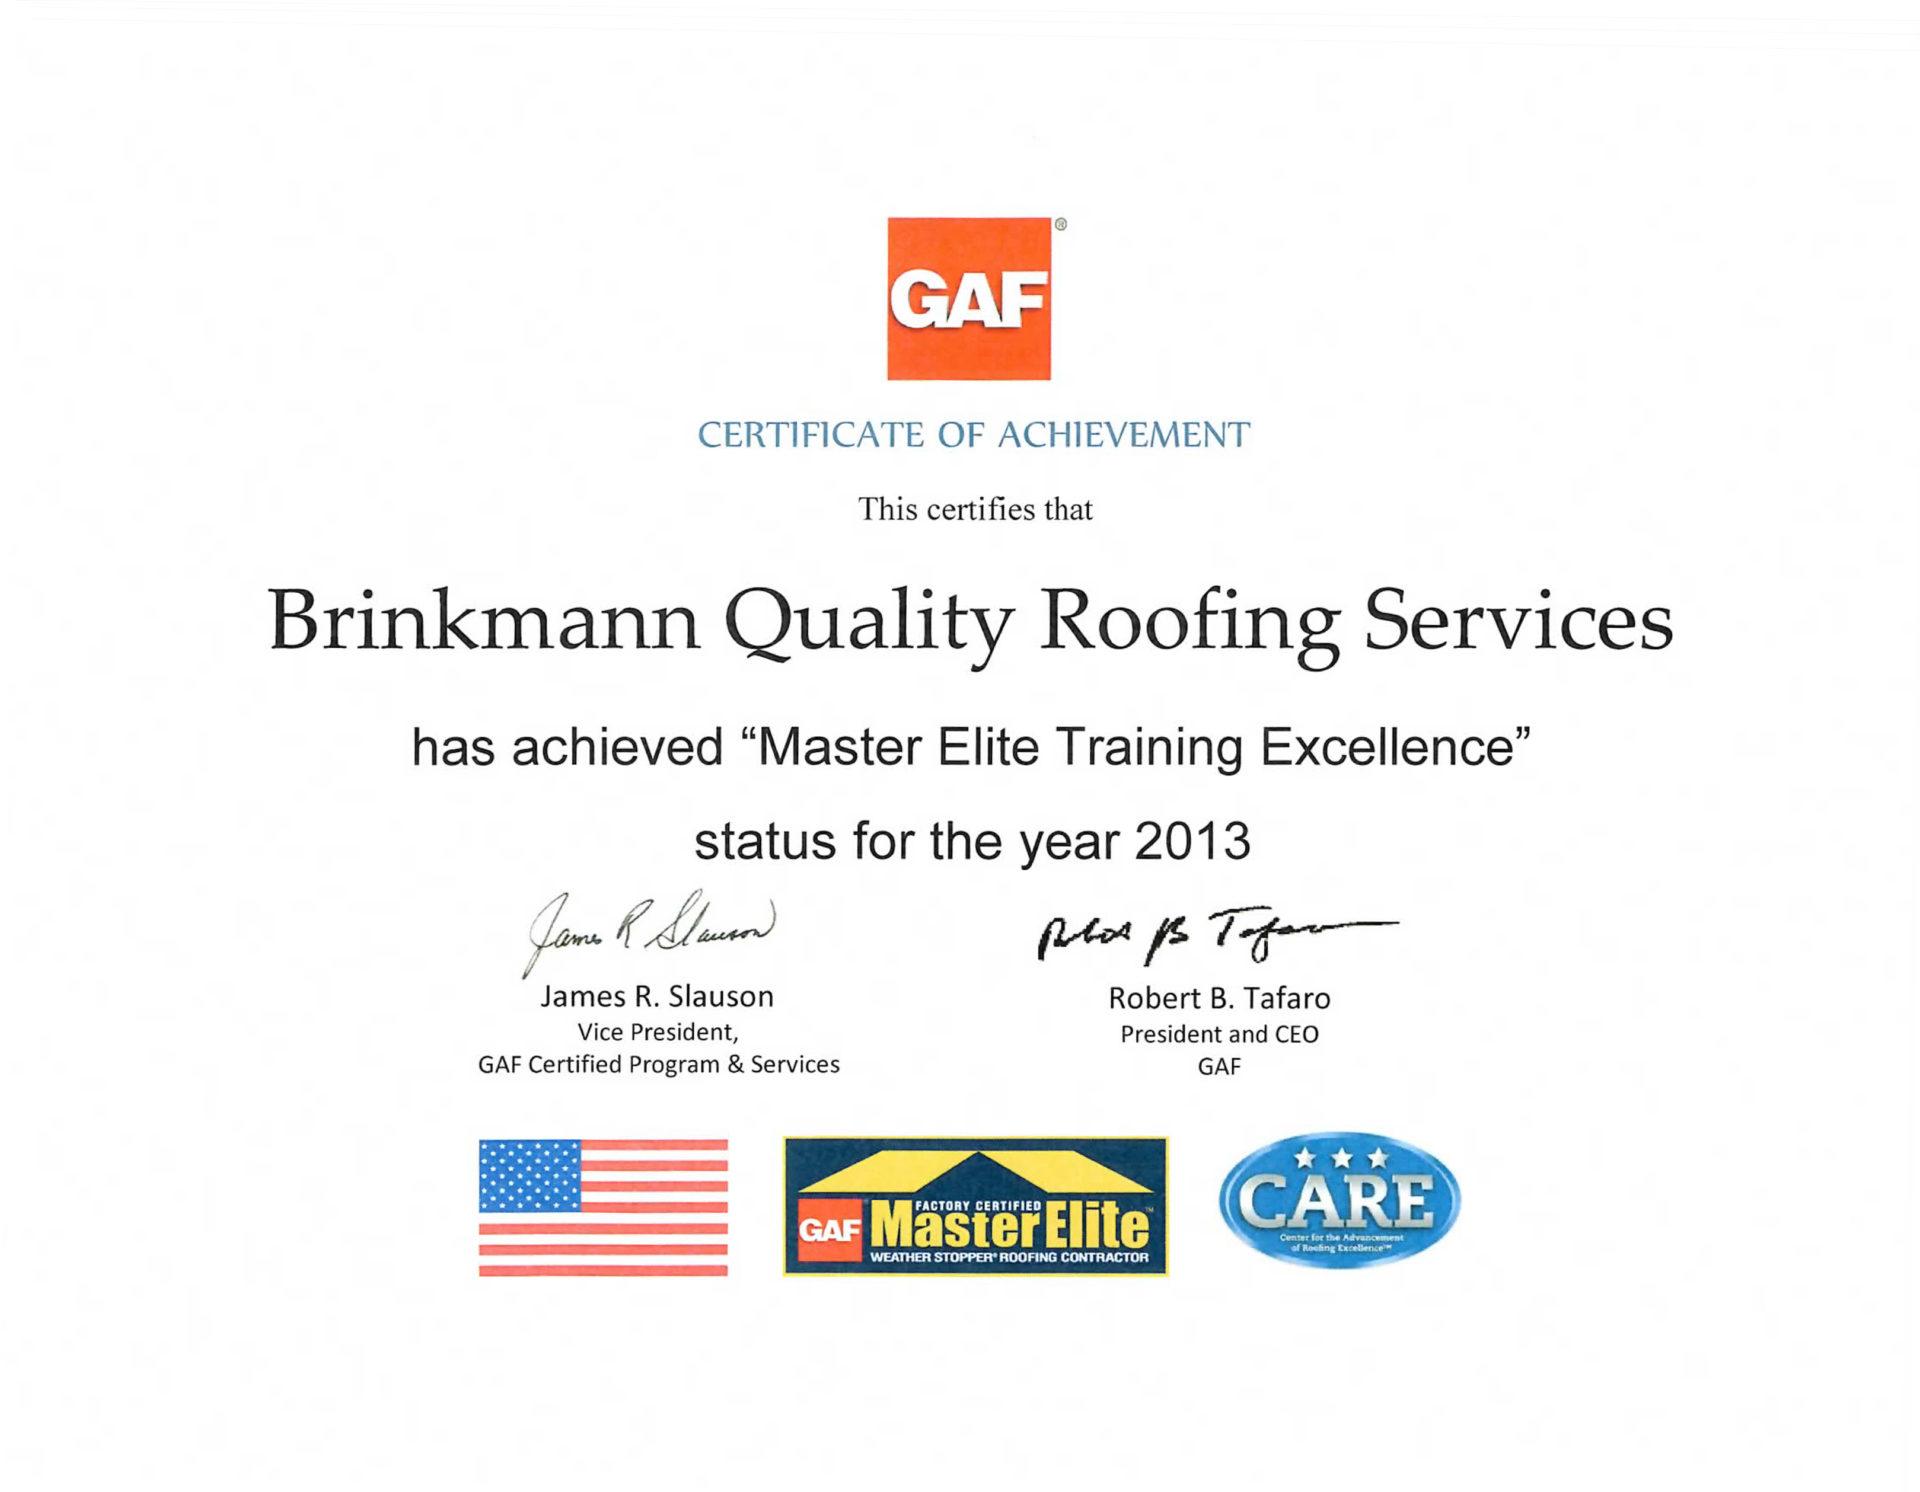 Master Elite Training Excellence